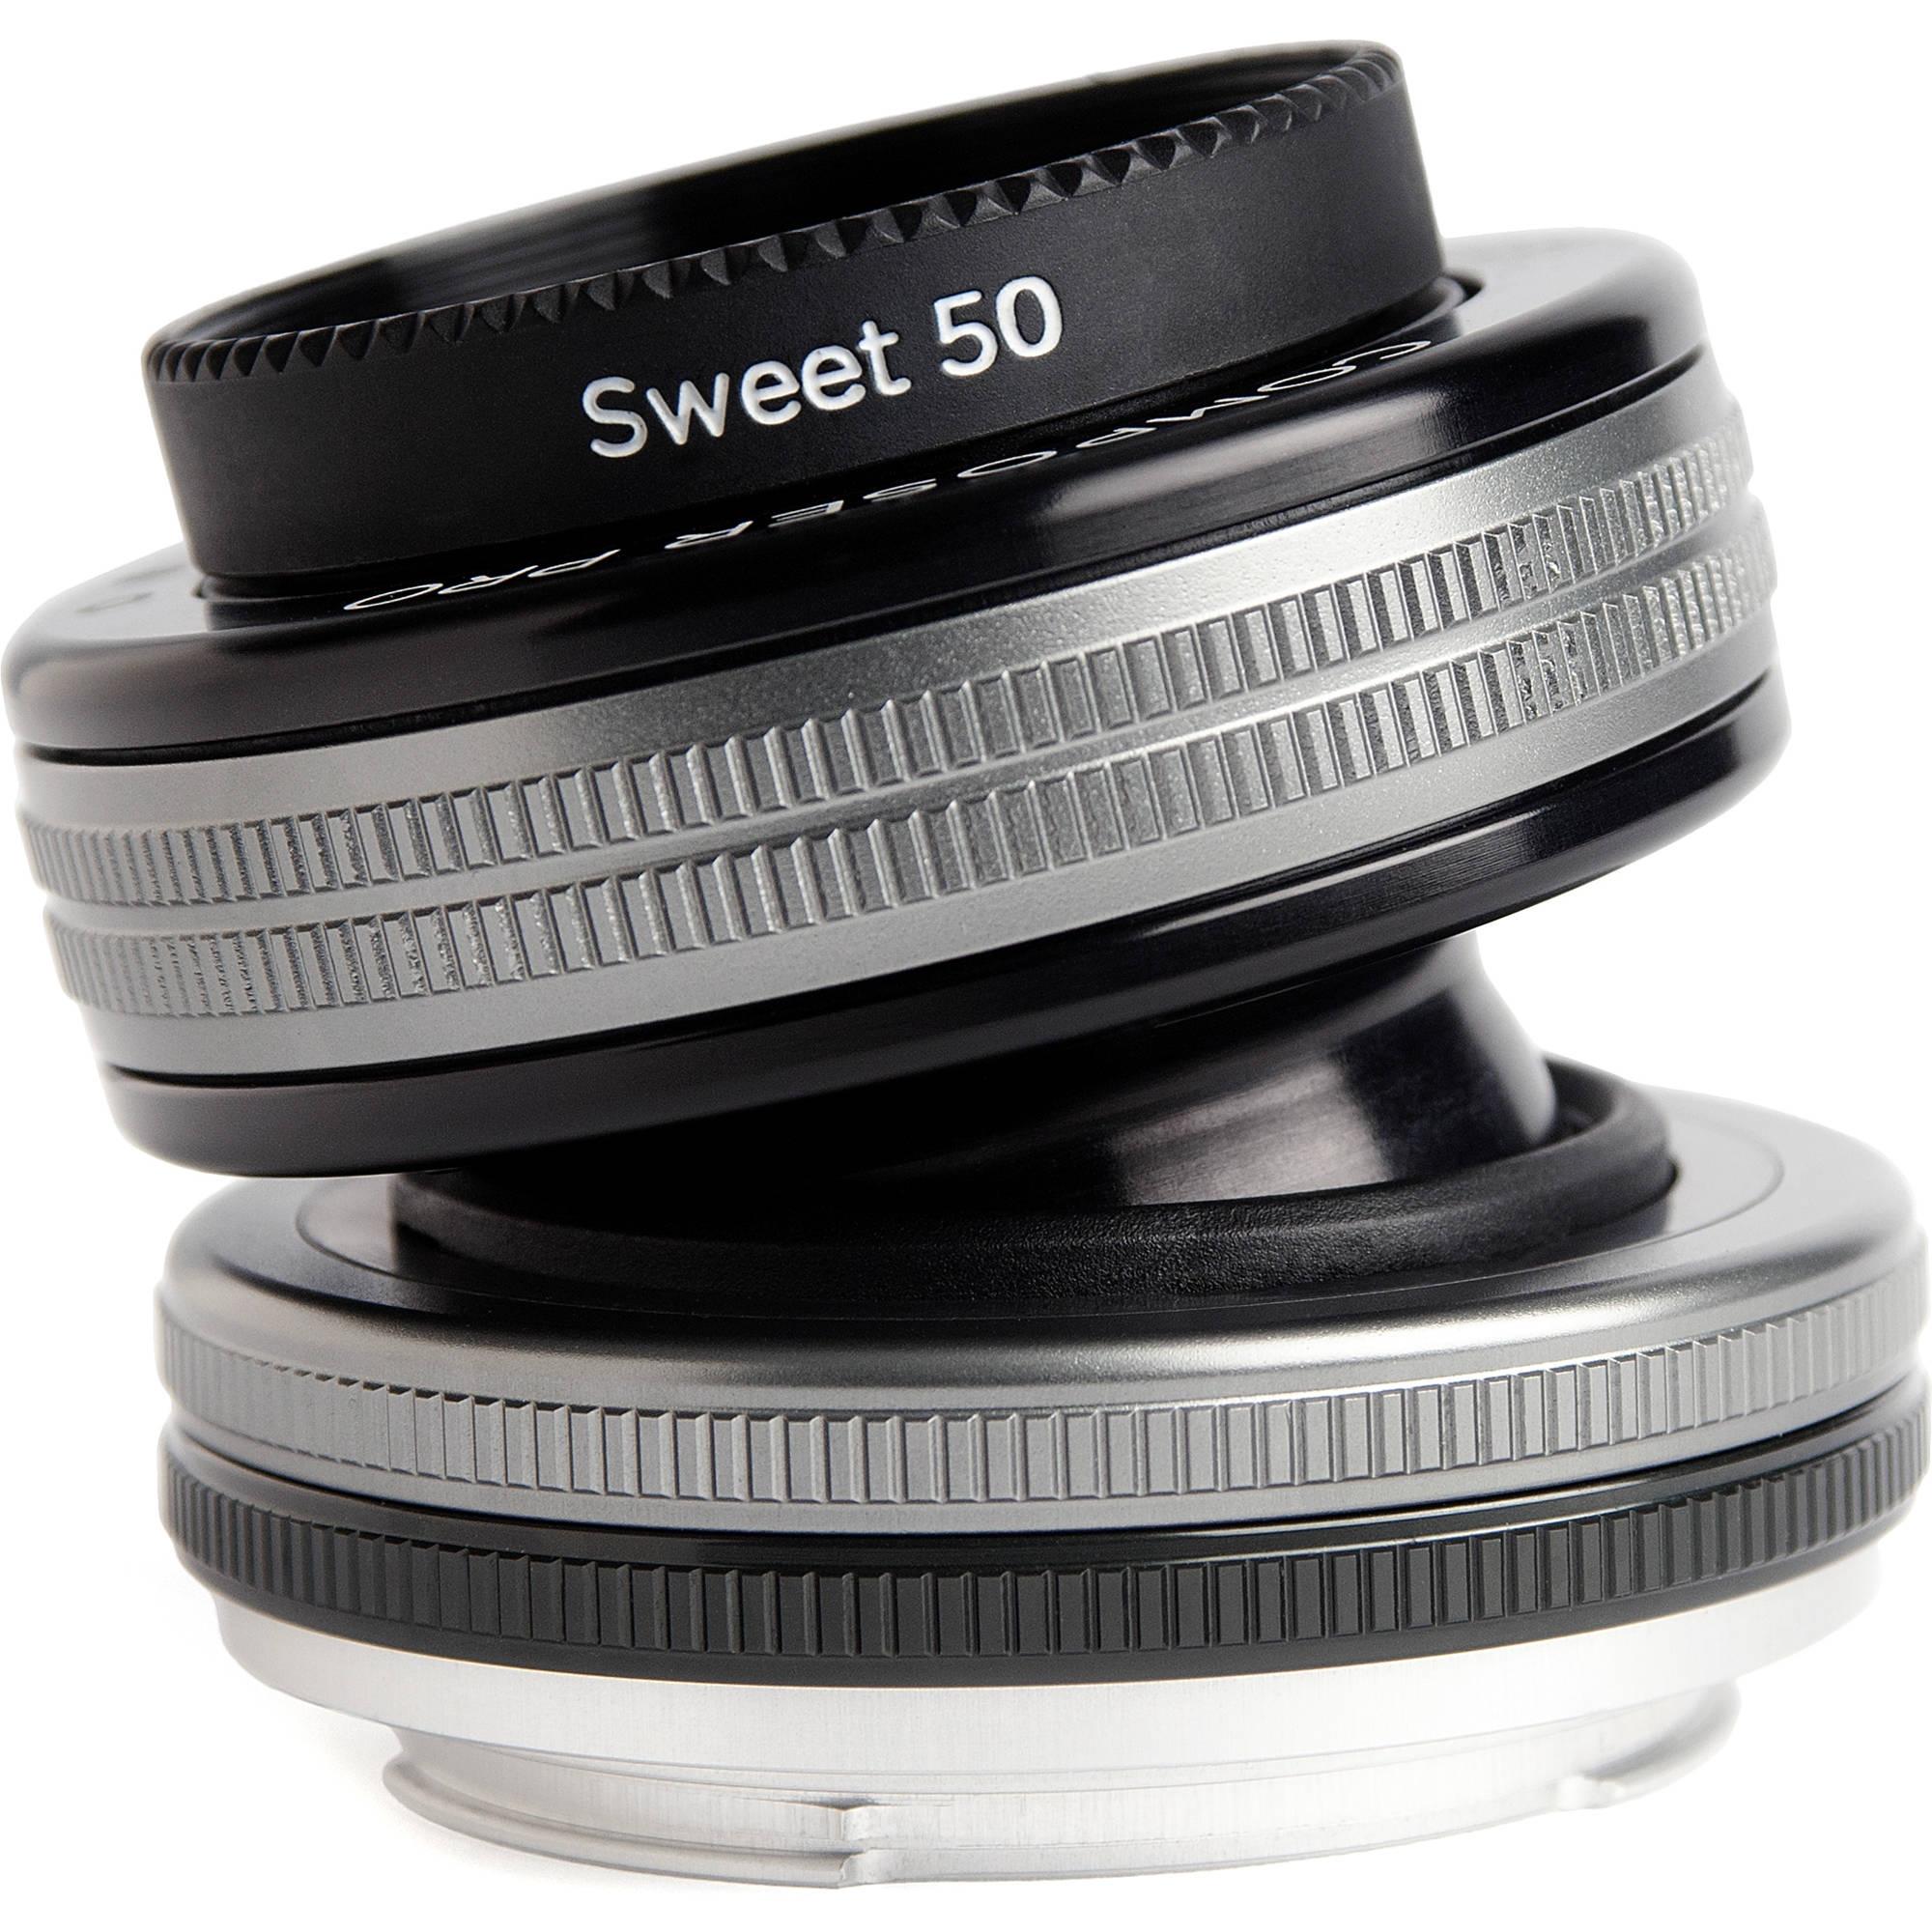 LENSBABY Composer Pro II Sweet 50 pro Fujifilm X